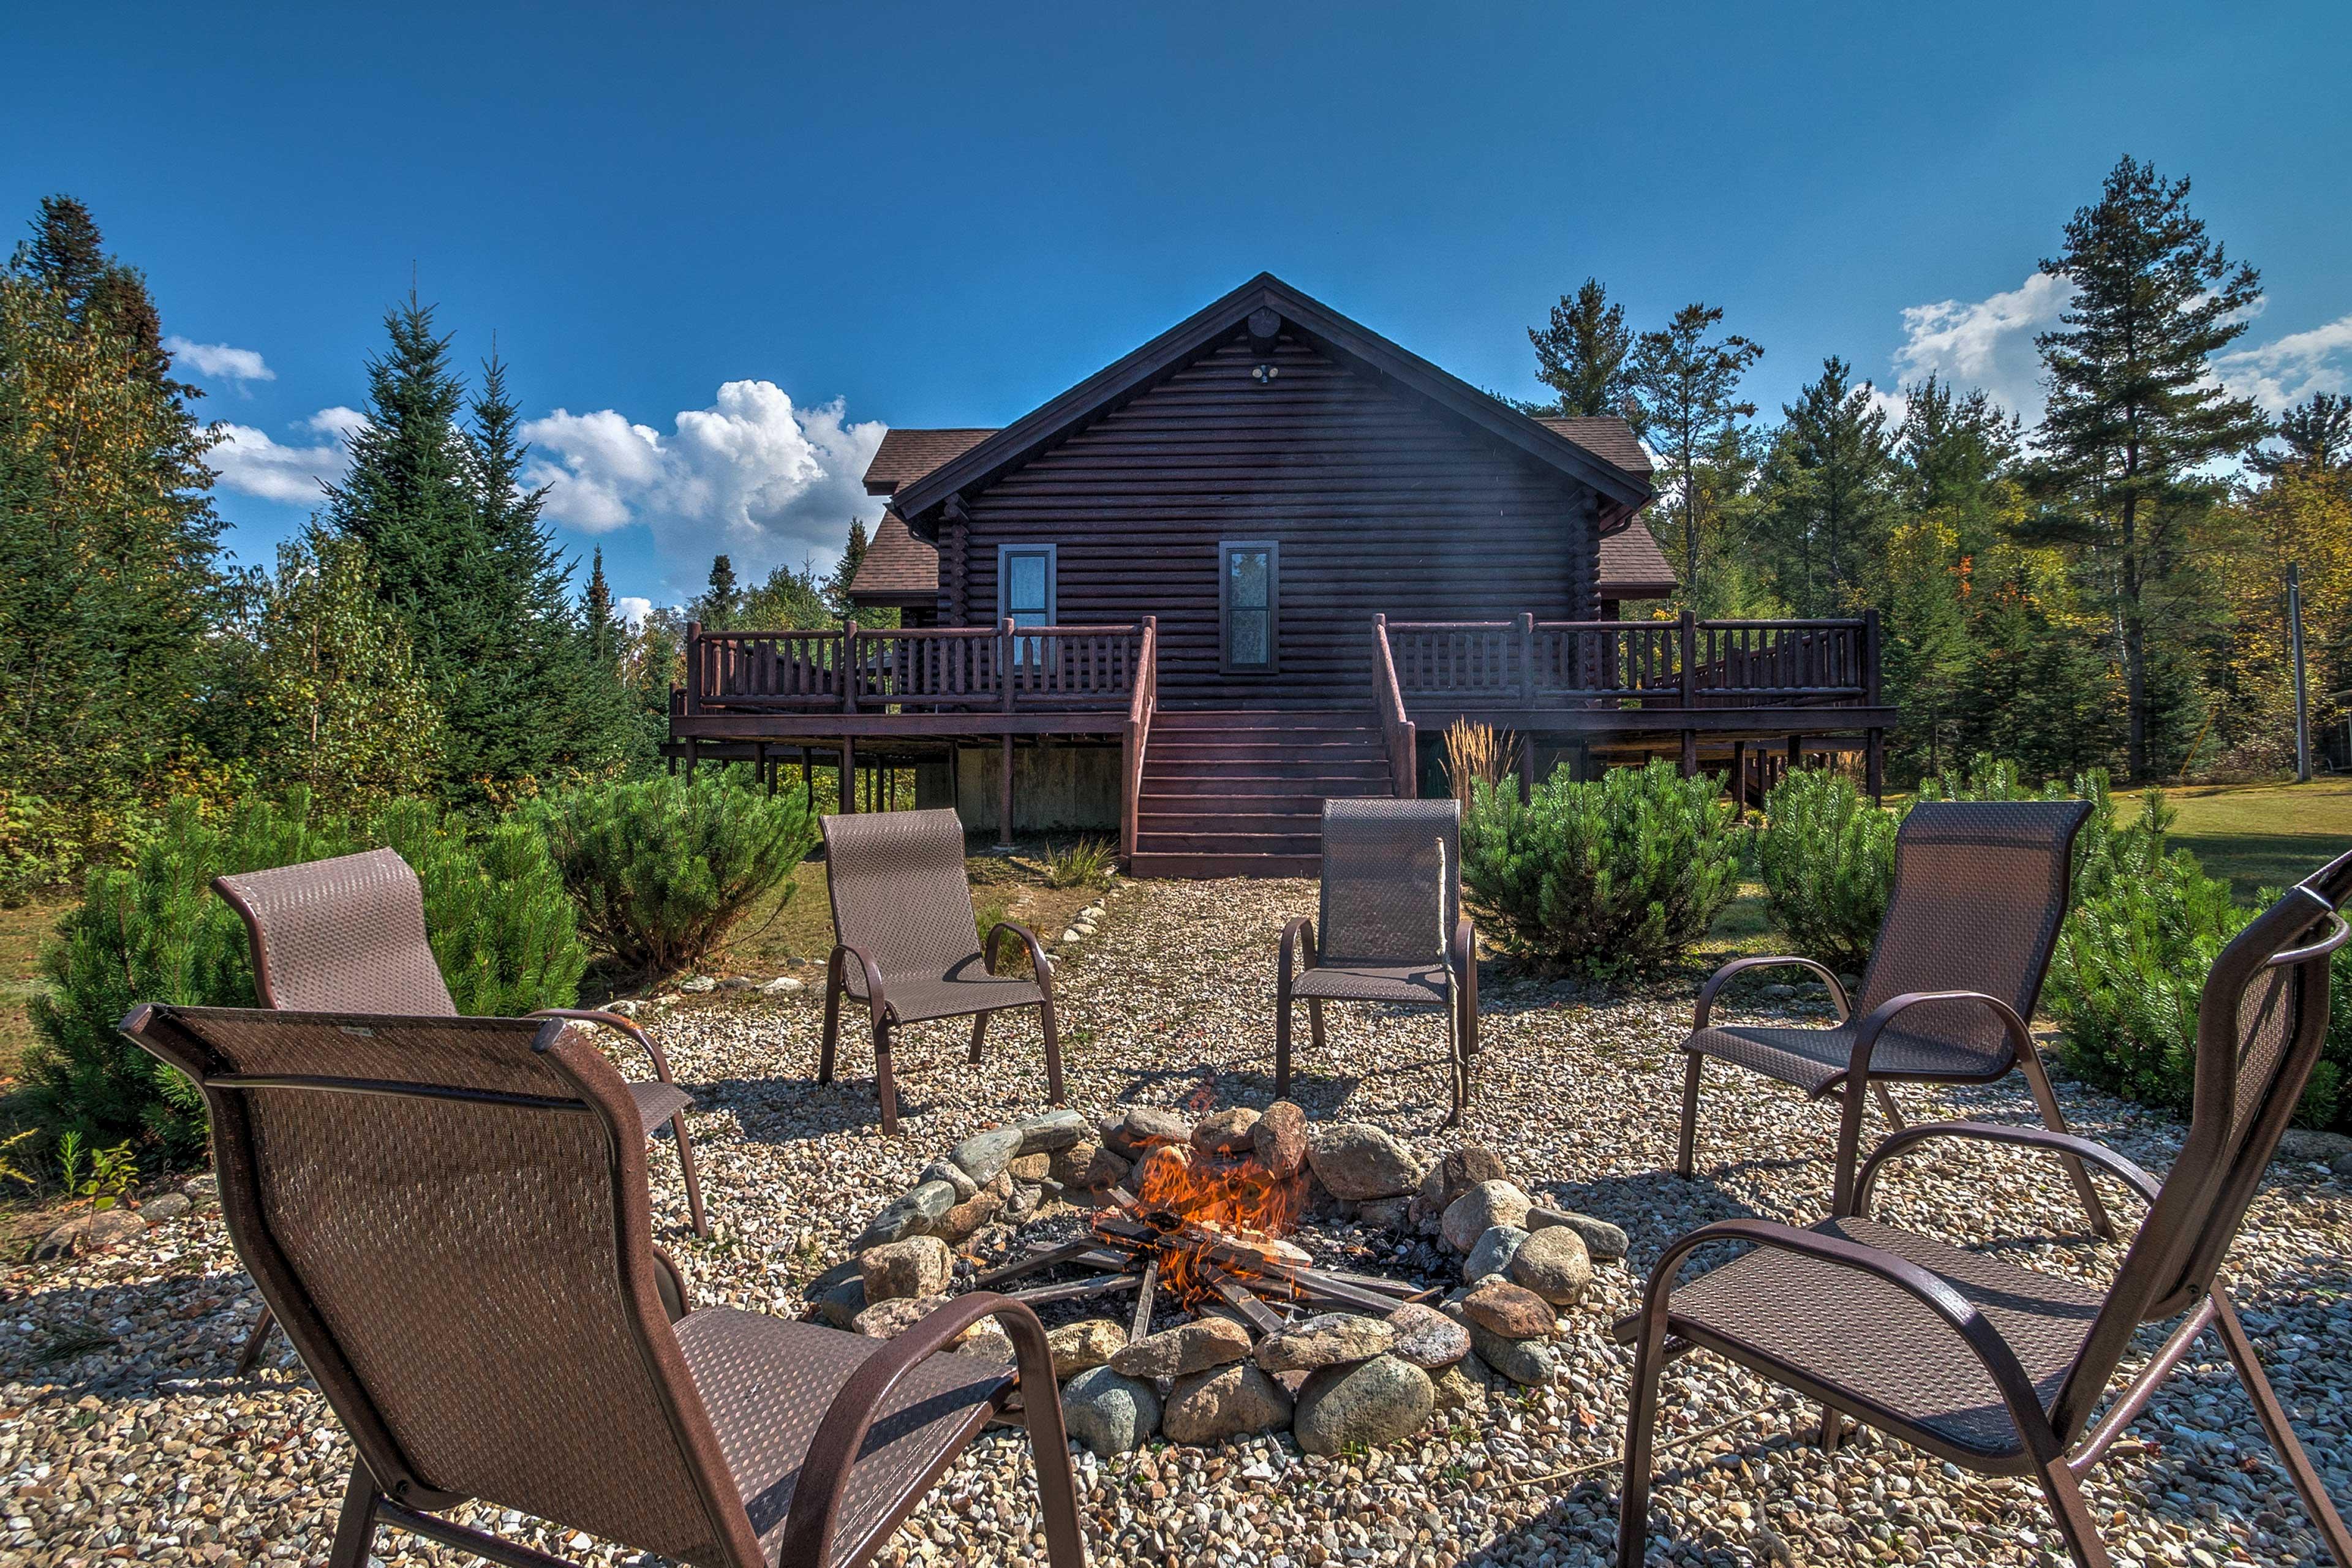 Nature awaits at this beautiful 3-bedroom, 3-bathroom vacation rental cabin!